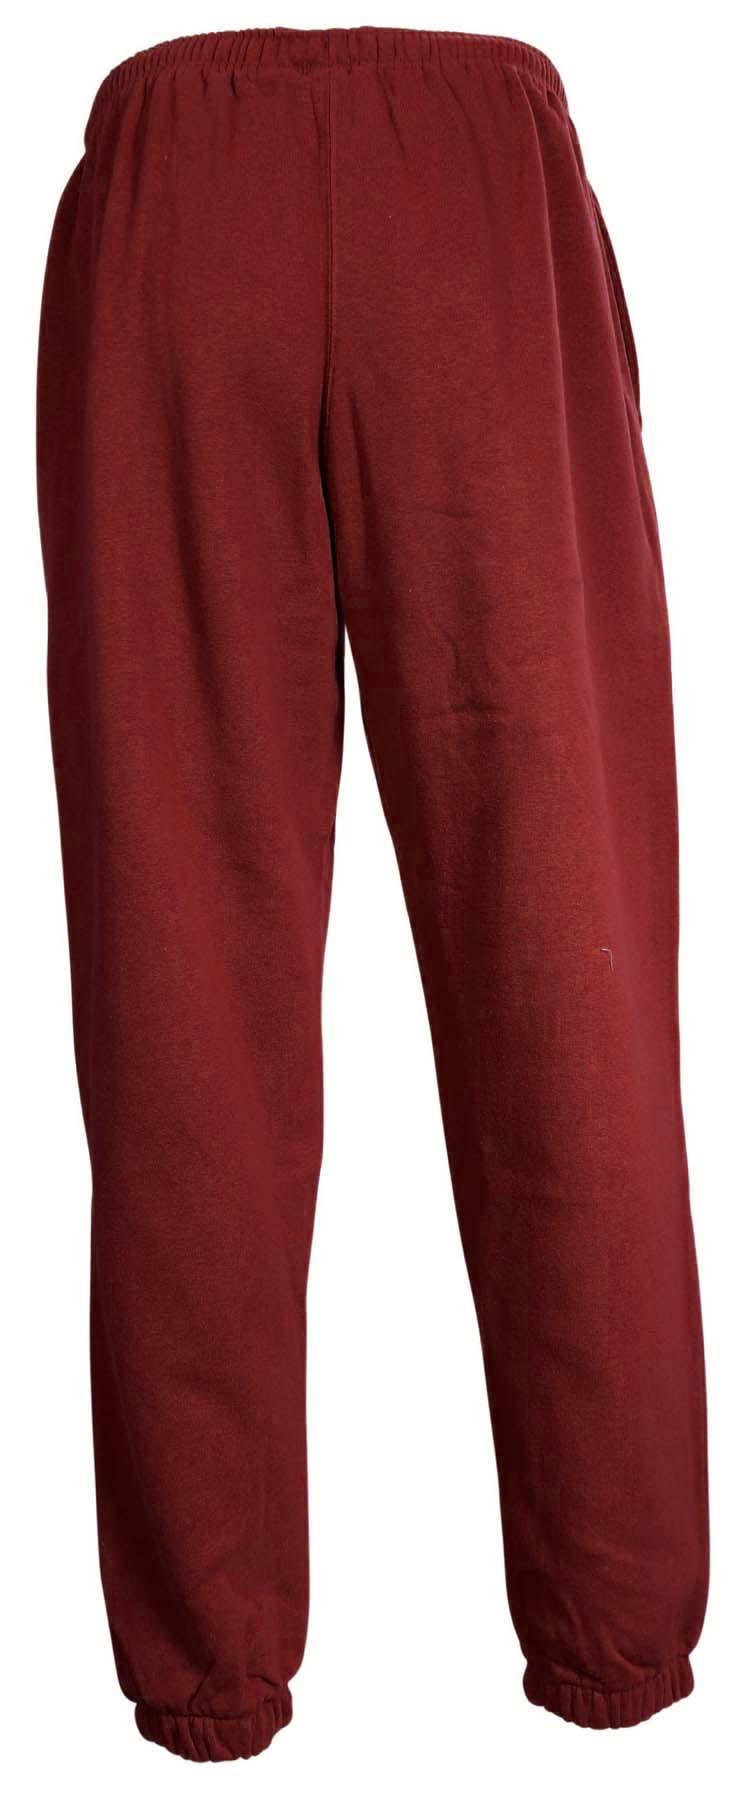 Nike Men's Classic Fleece Sweatpants